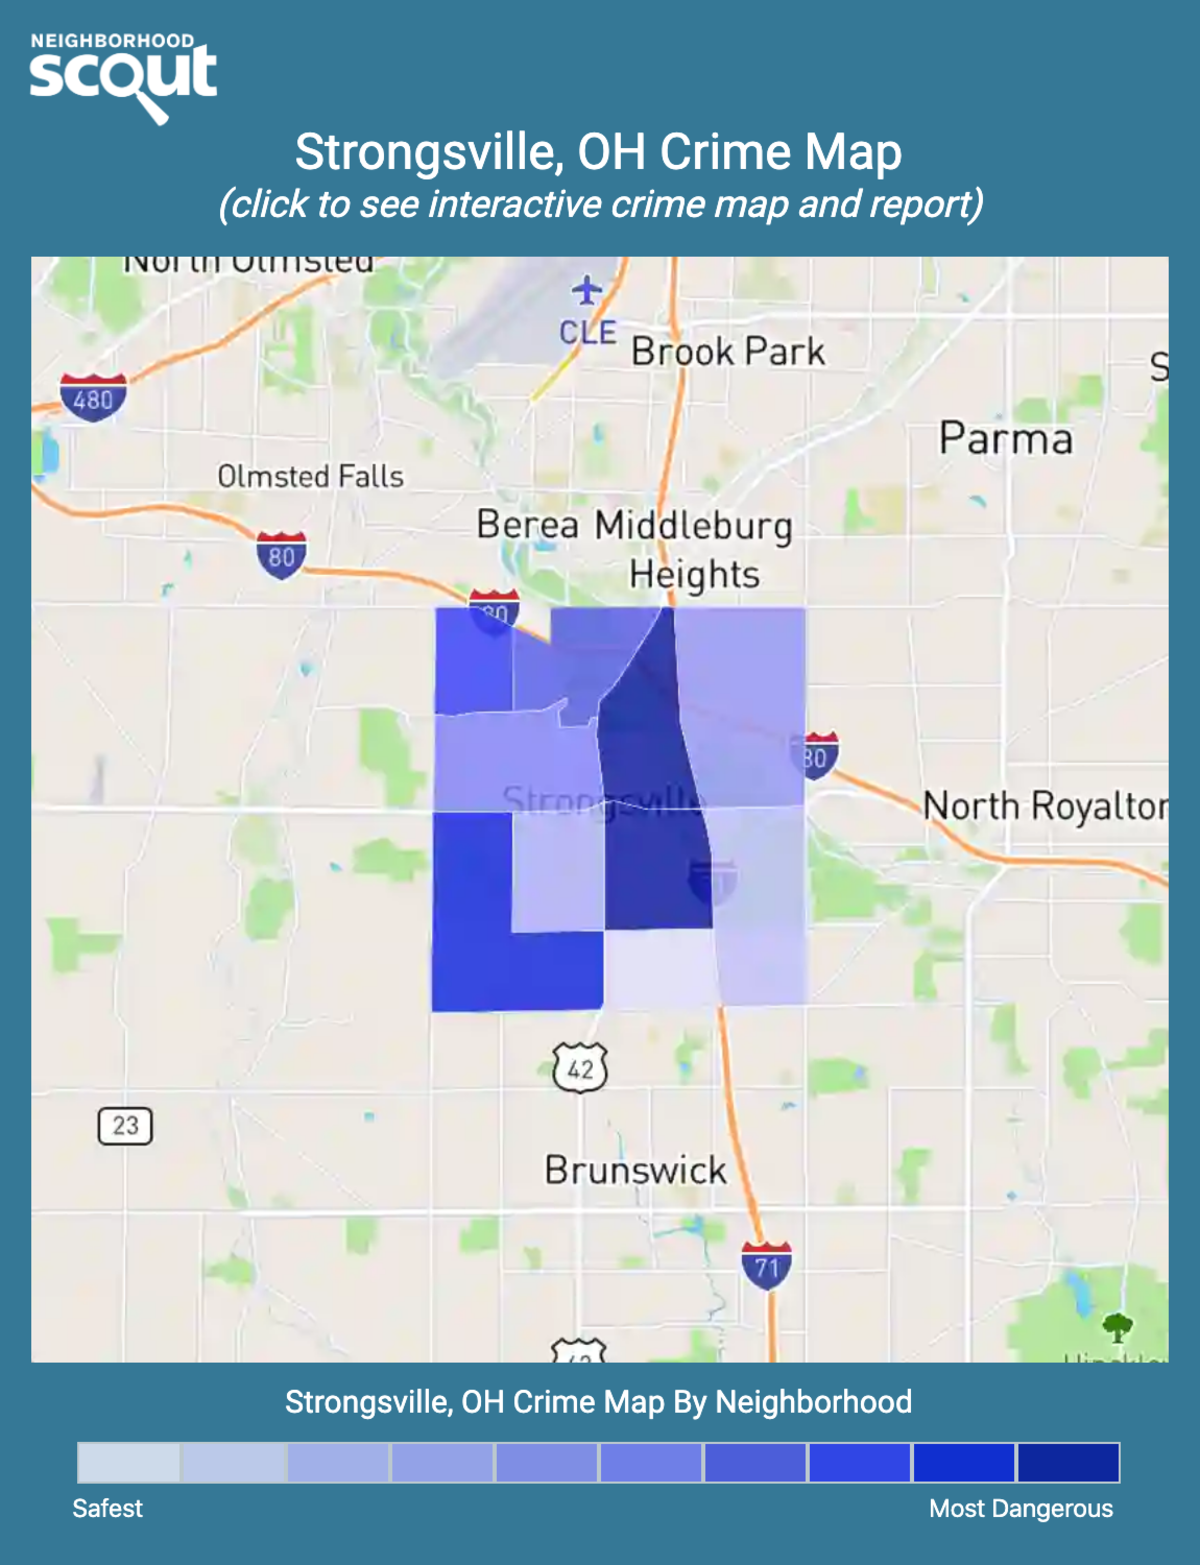 Strongsville, Ohio crime map